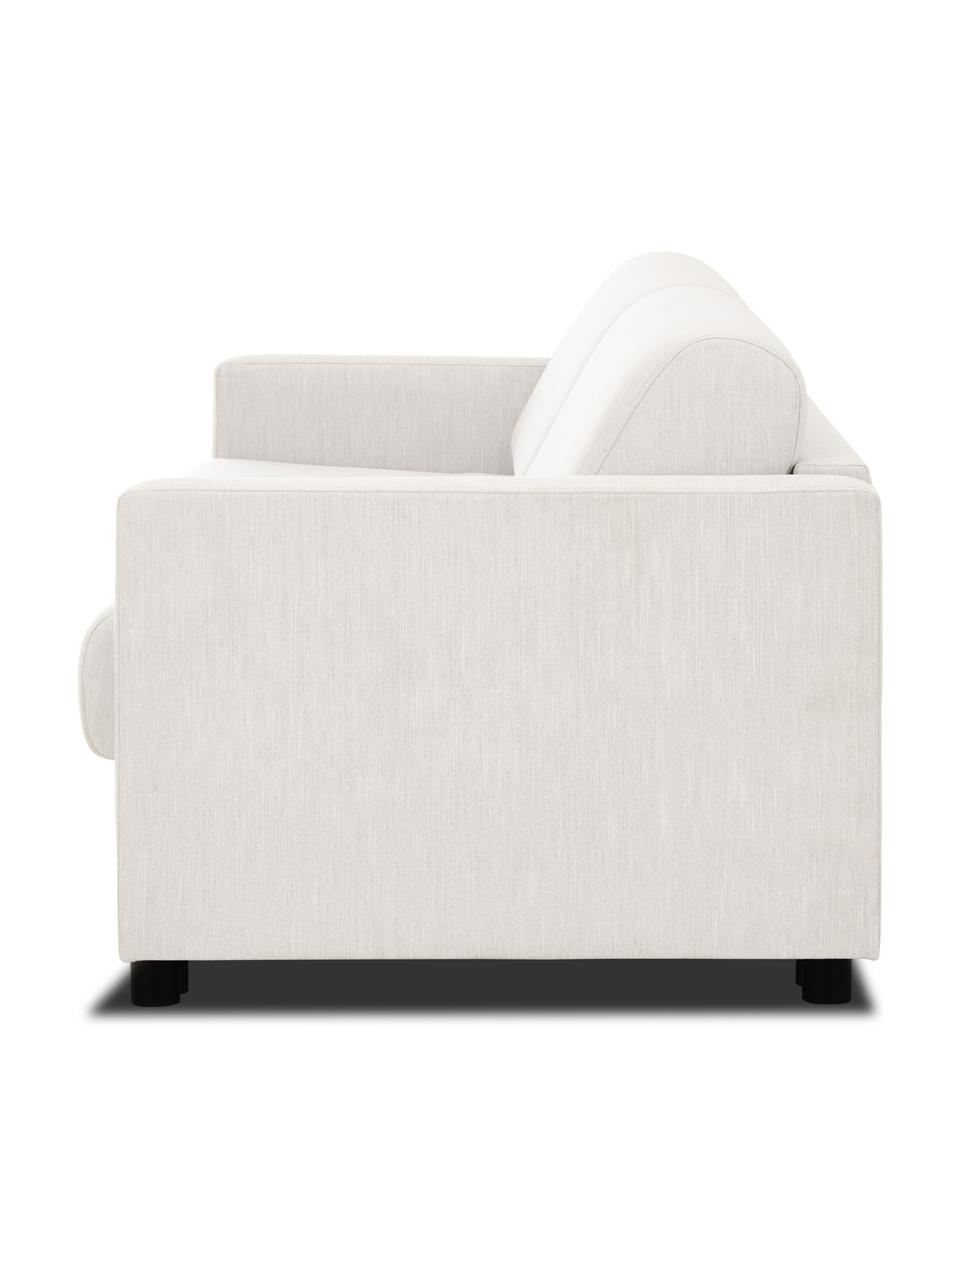 Canapé convertible 2 places tissu beige avec matelas Morgan, Tissu beige